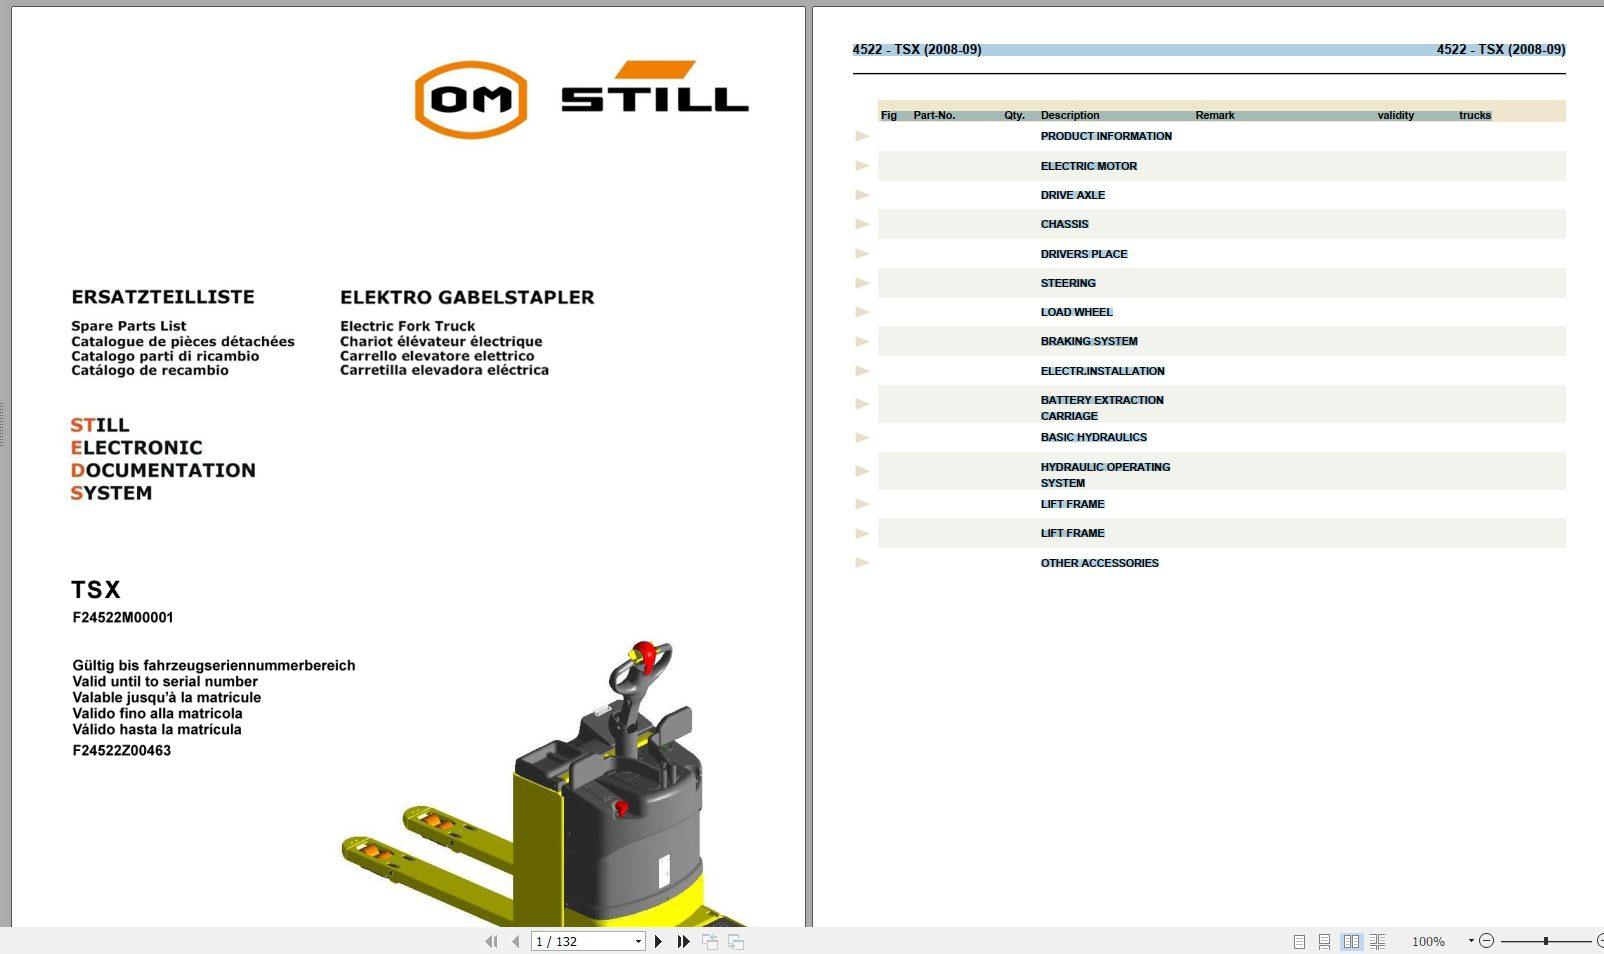 Still_Steds_Forklift_Truck_TSX_All_Series_2019_Spare_Parts_Catalog_EN_1VaU6